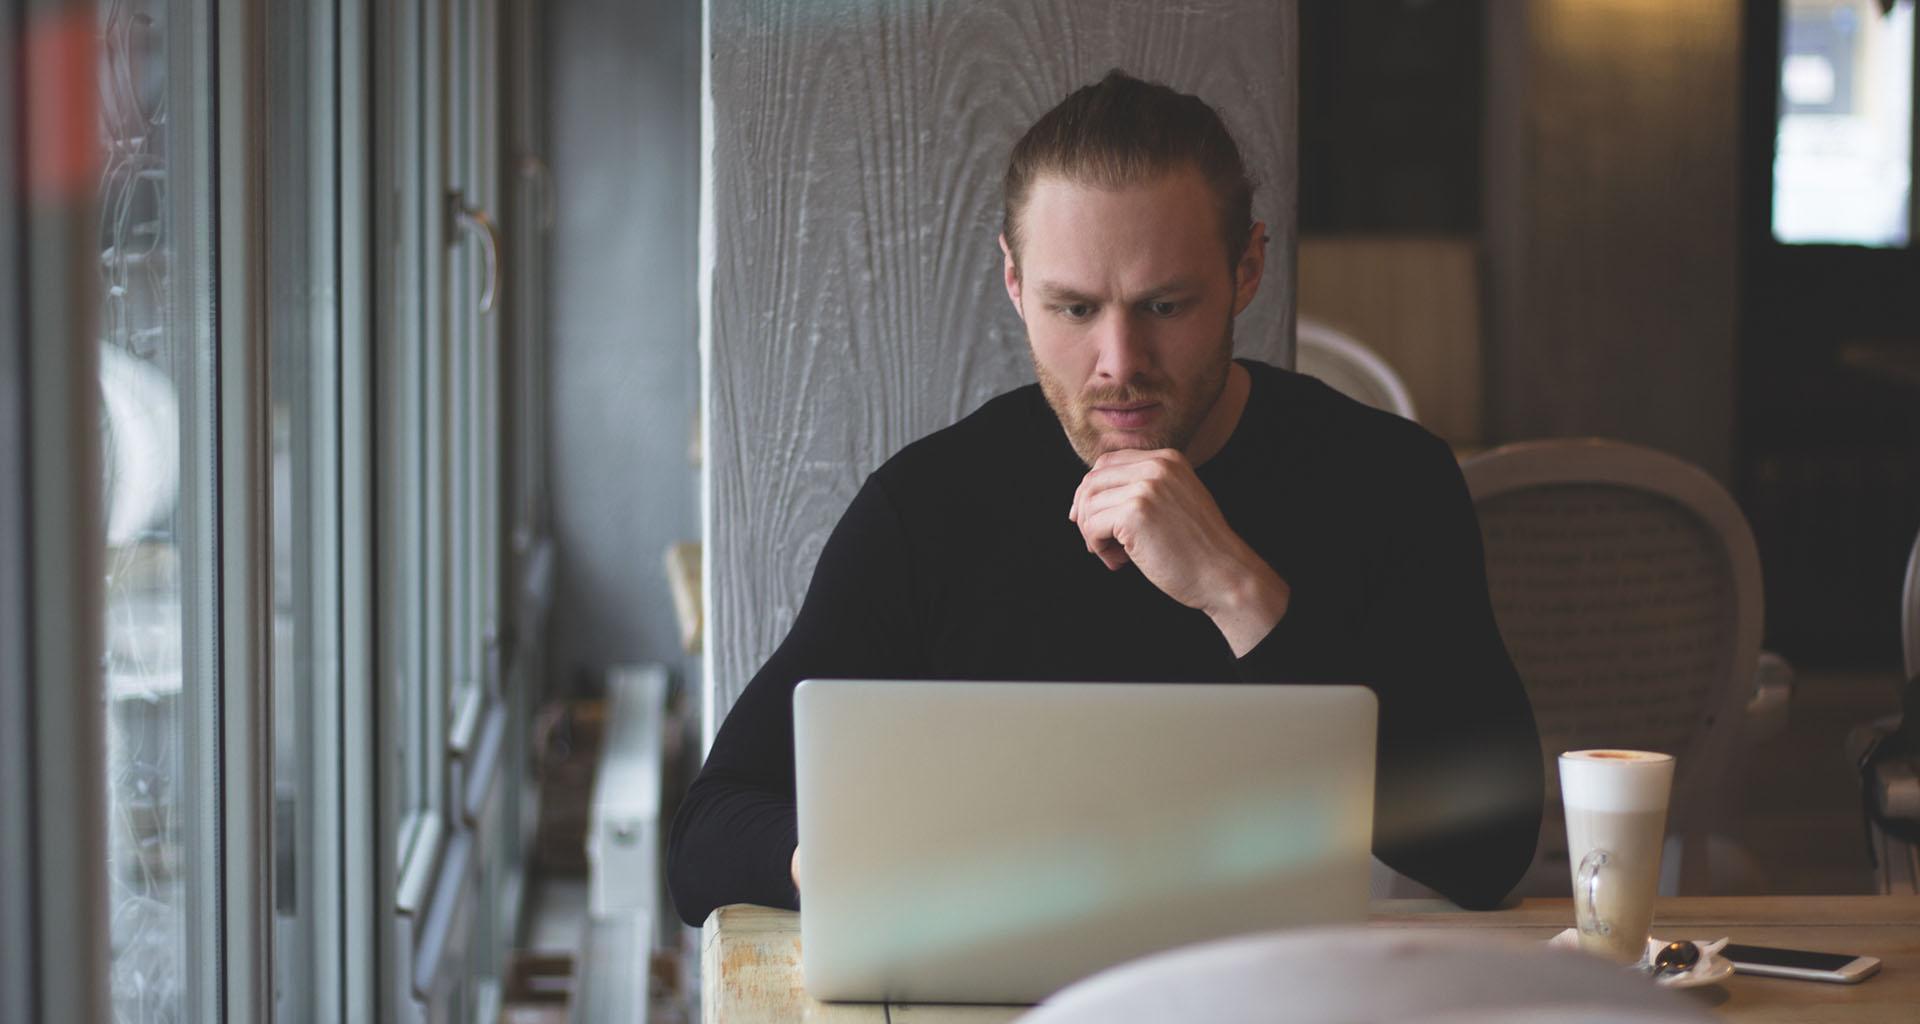 suspicious man uses internet search